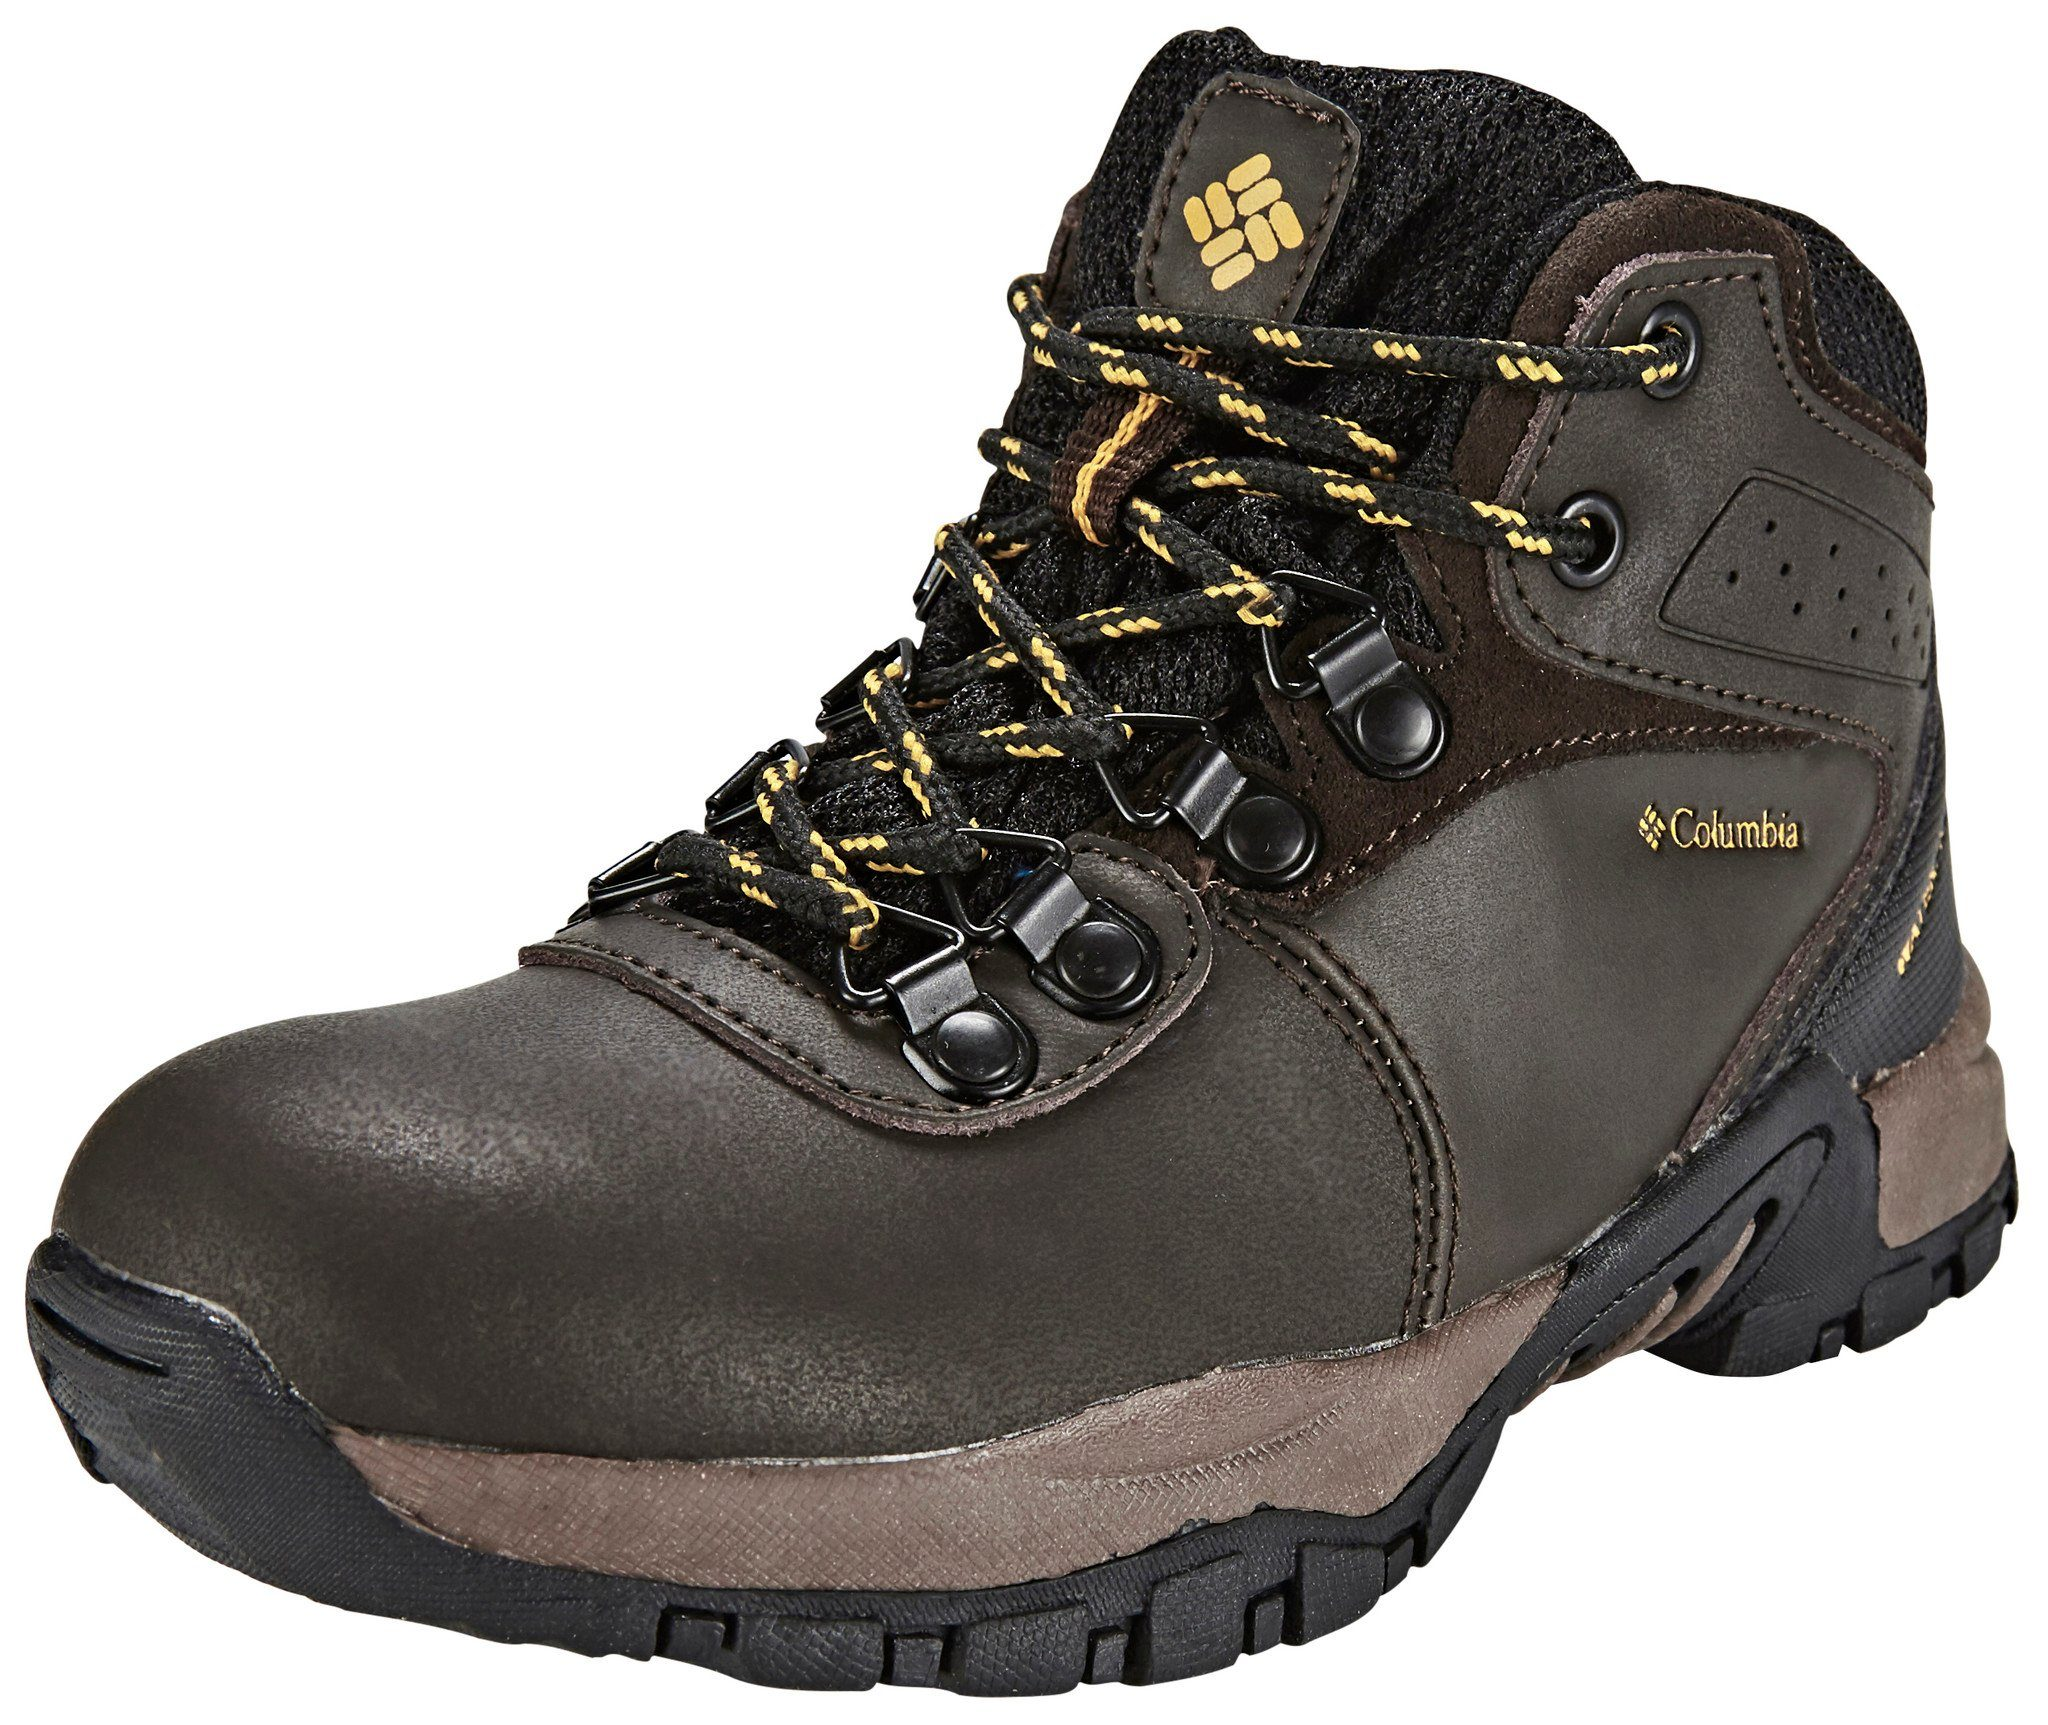 Columbia Kletterschuh »Newton Ridge Waterproof Shoes Youth«